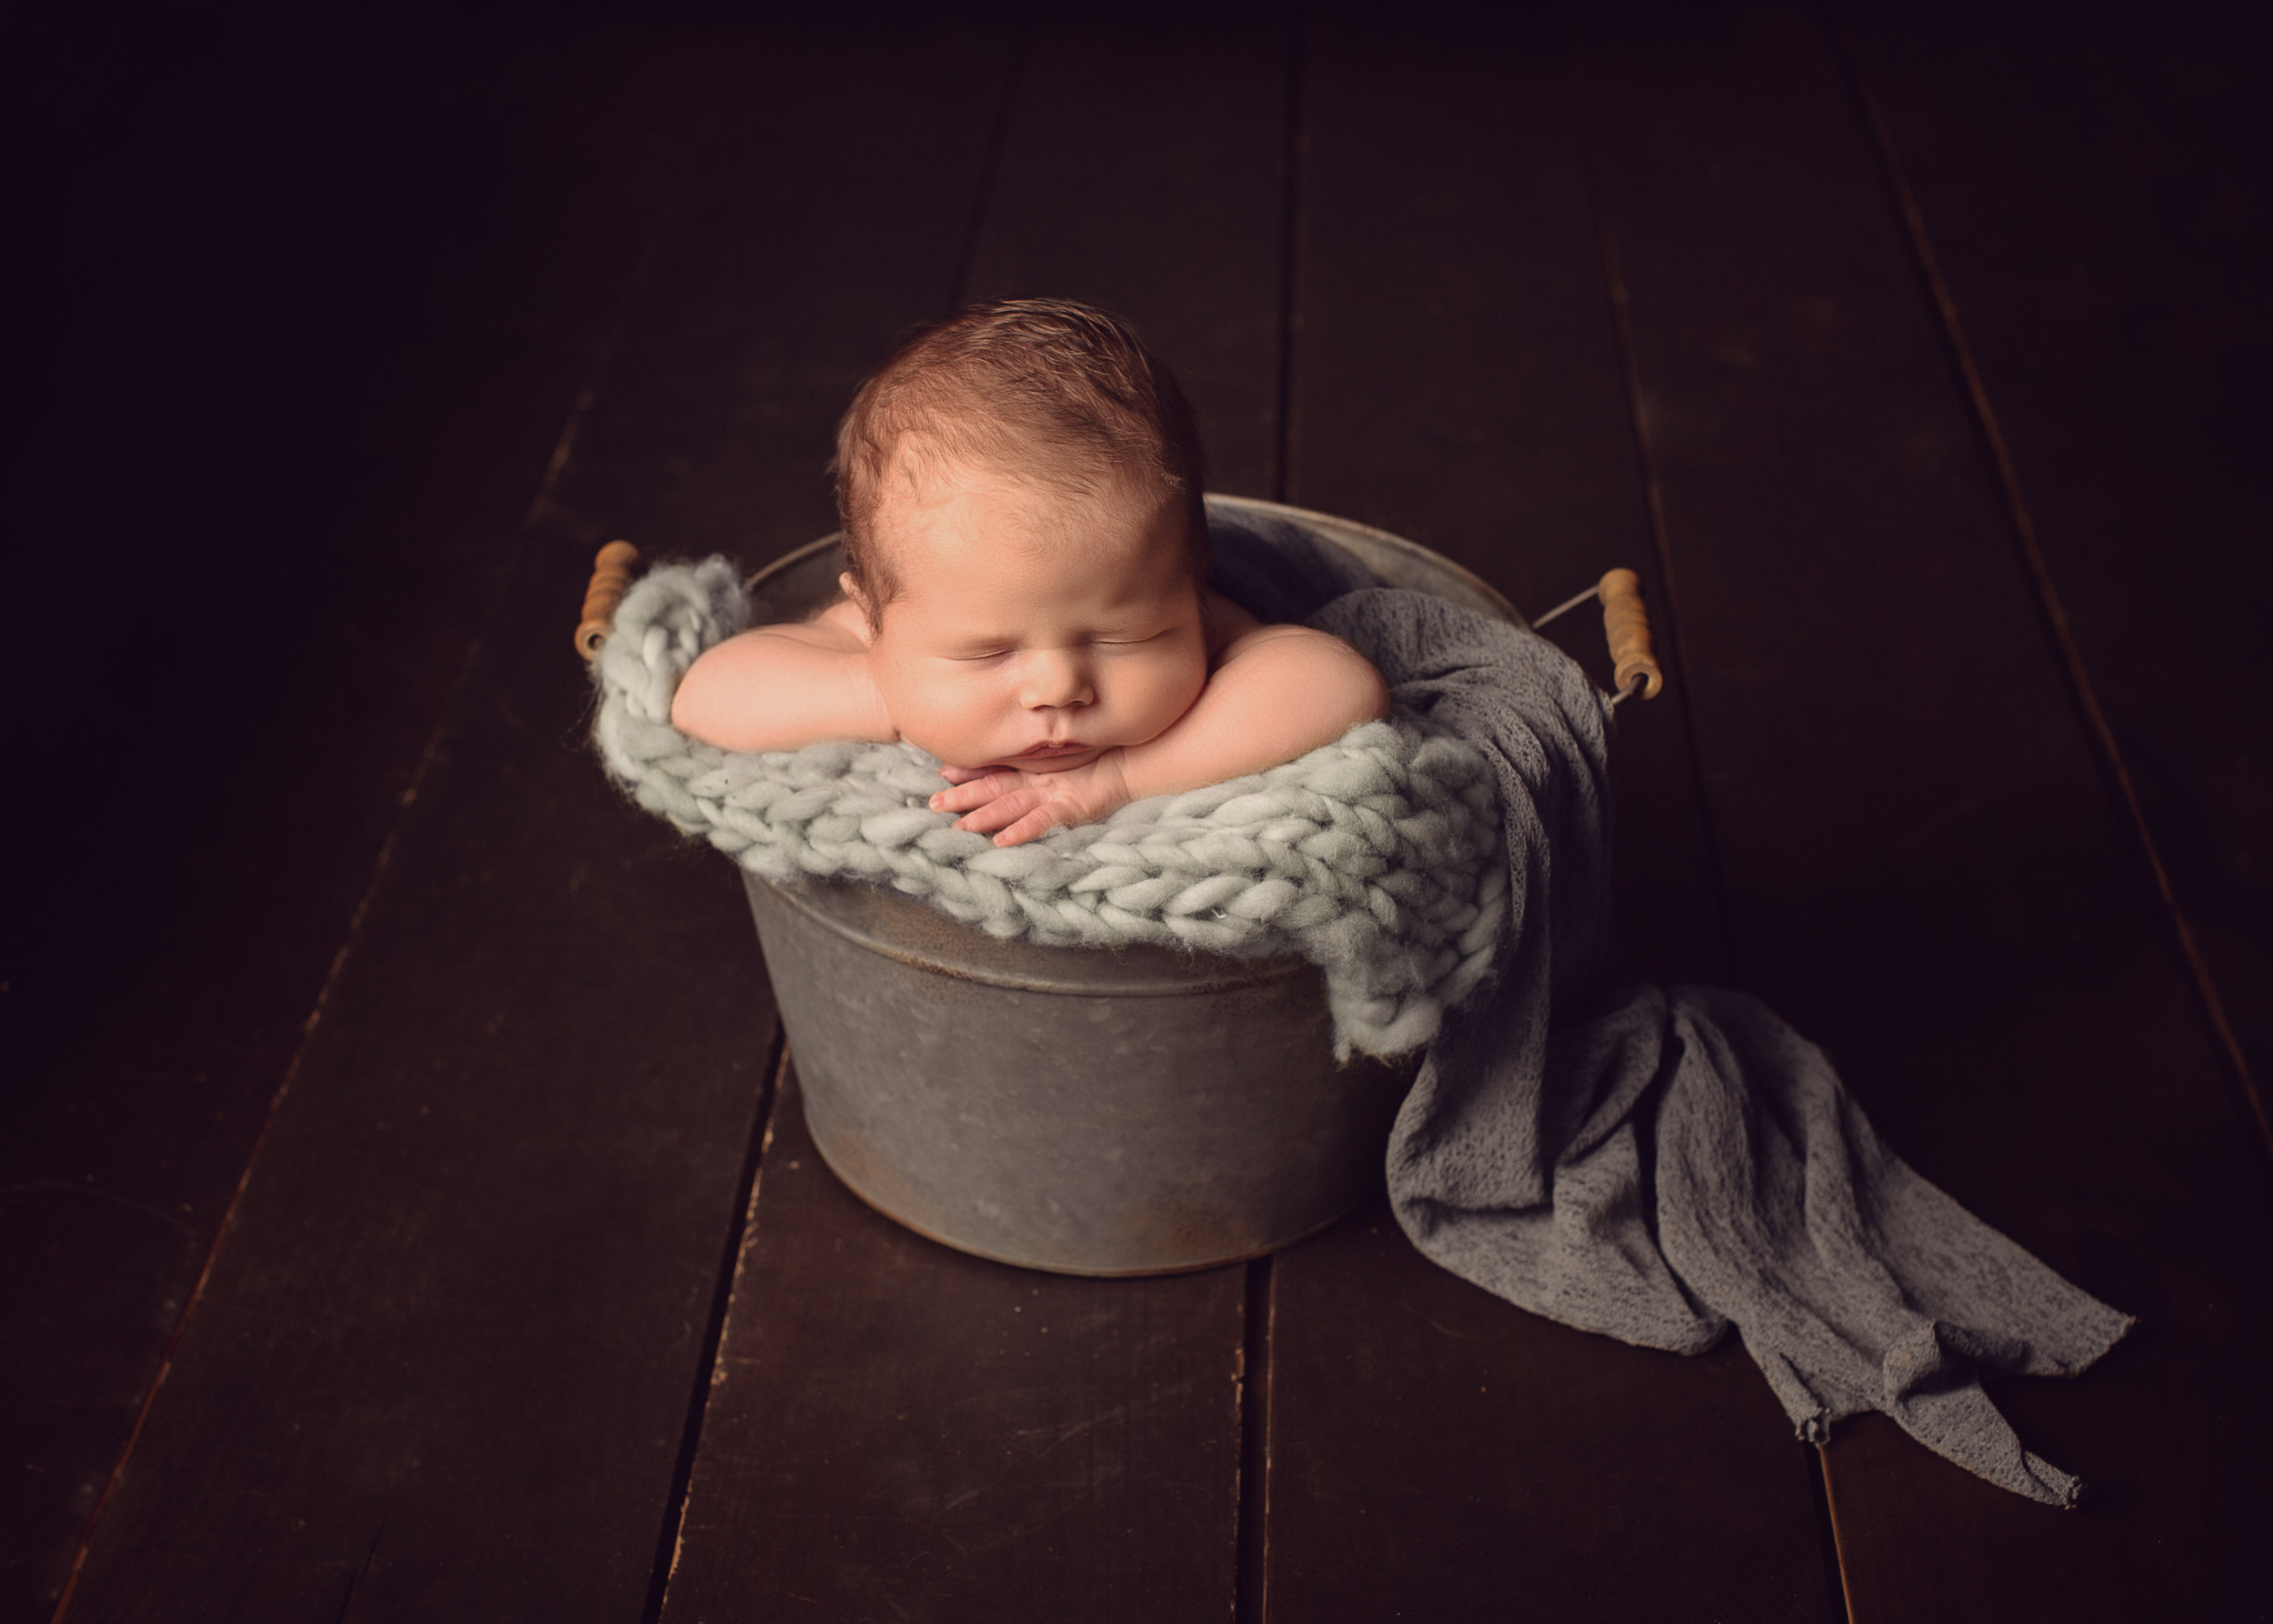 millbury_newborn_photographer_massachusetts_boston_baby_boy_photos6.jpg